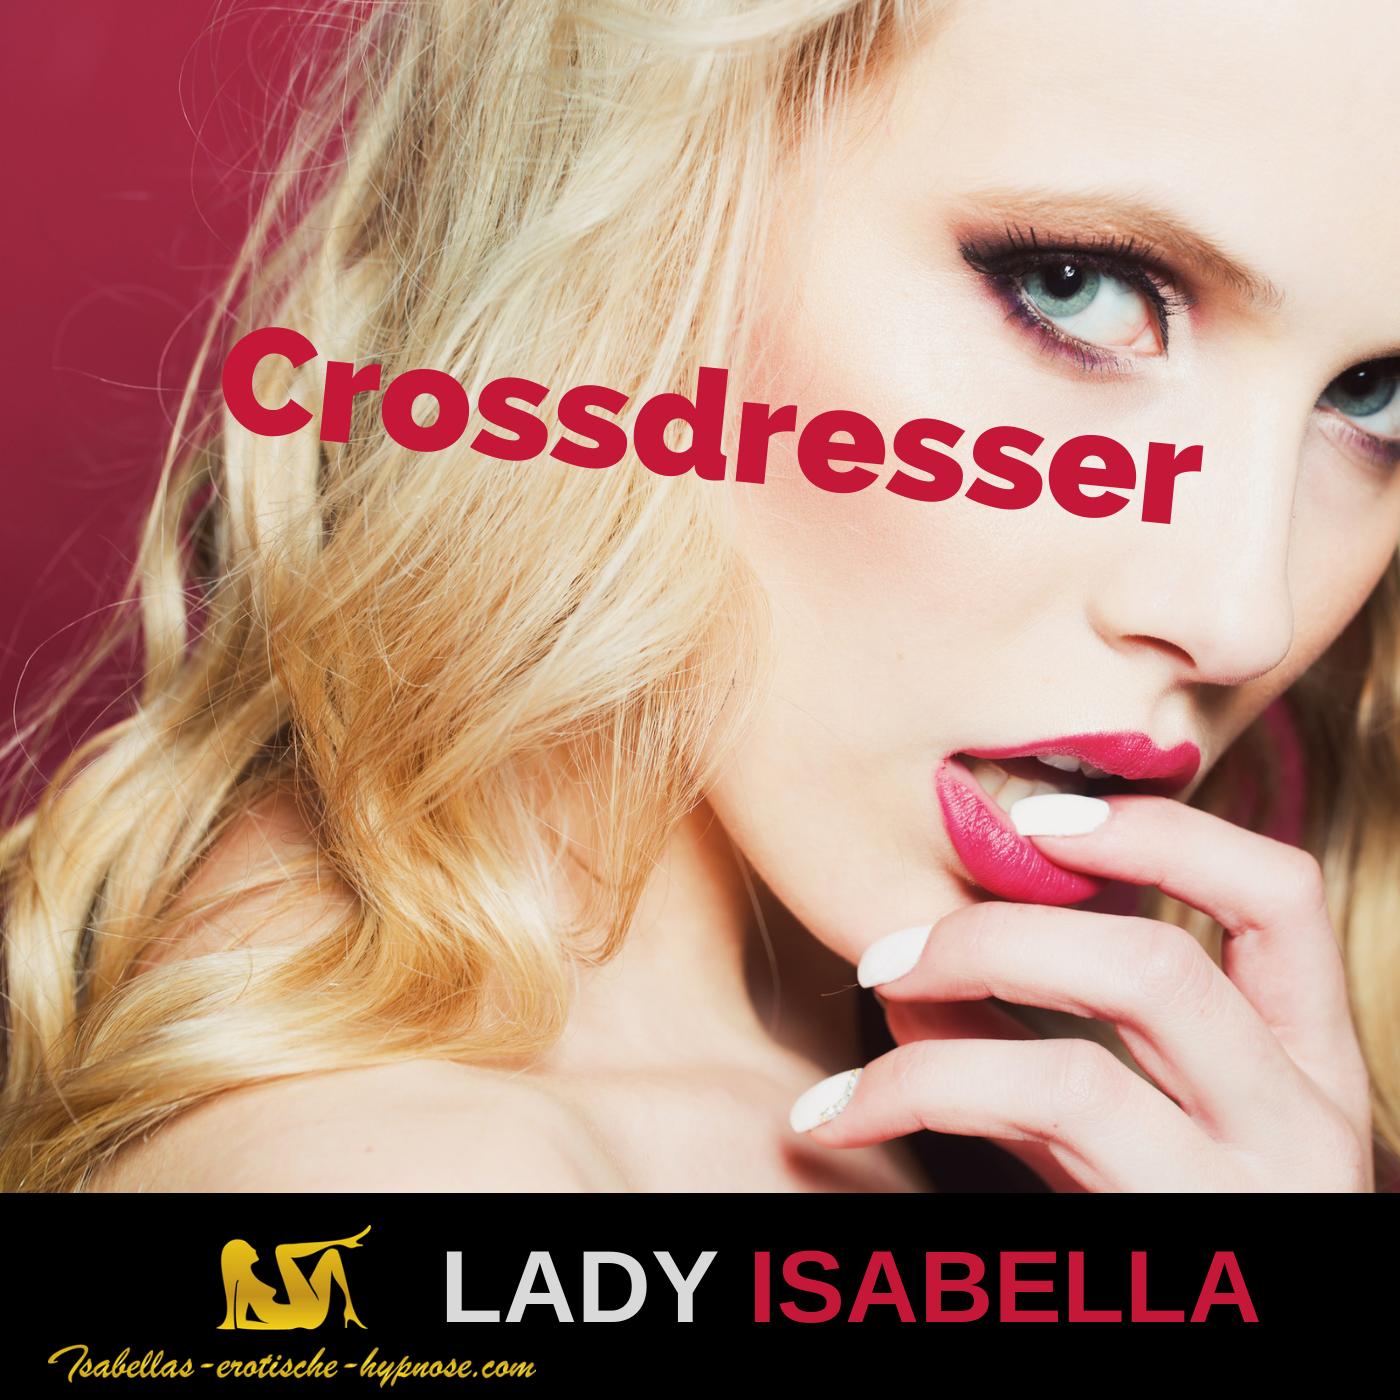 Crossdresser by Lady Isabella